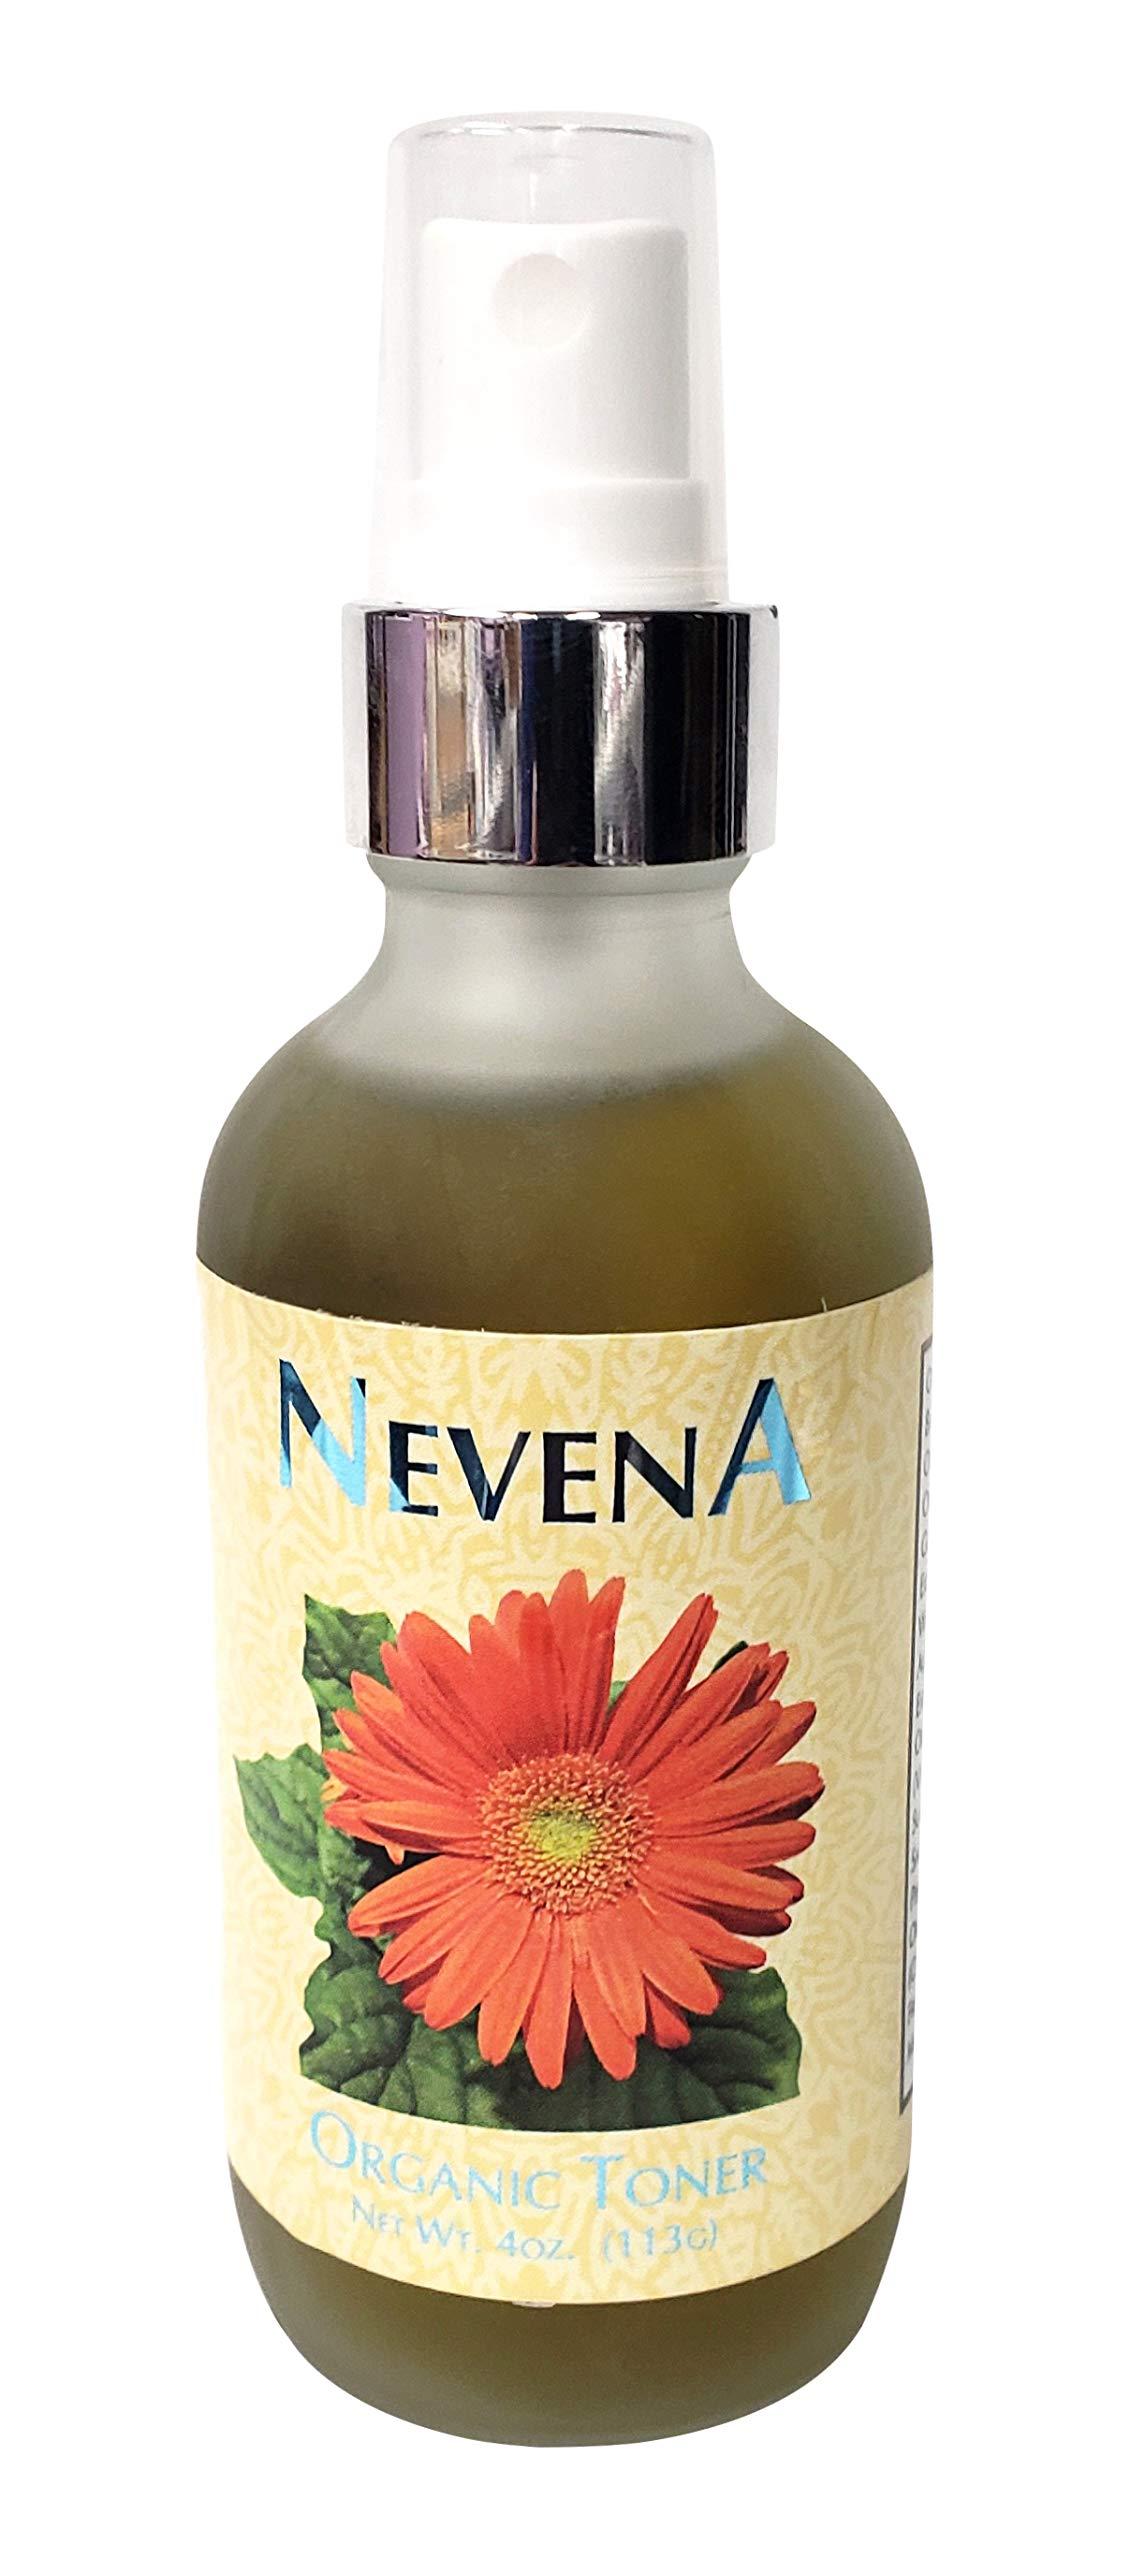 WFG WATERFALL GLEN SOAP COMPANY, LLC, Nevena, hydrating, face brightening, refresher, anti-aging, natural astringent, organic peppermint & Bulgarian rose toner